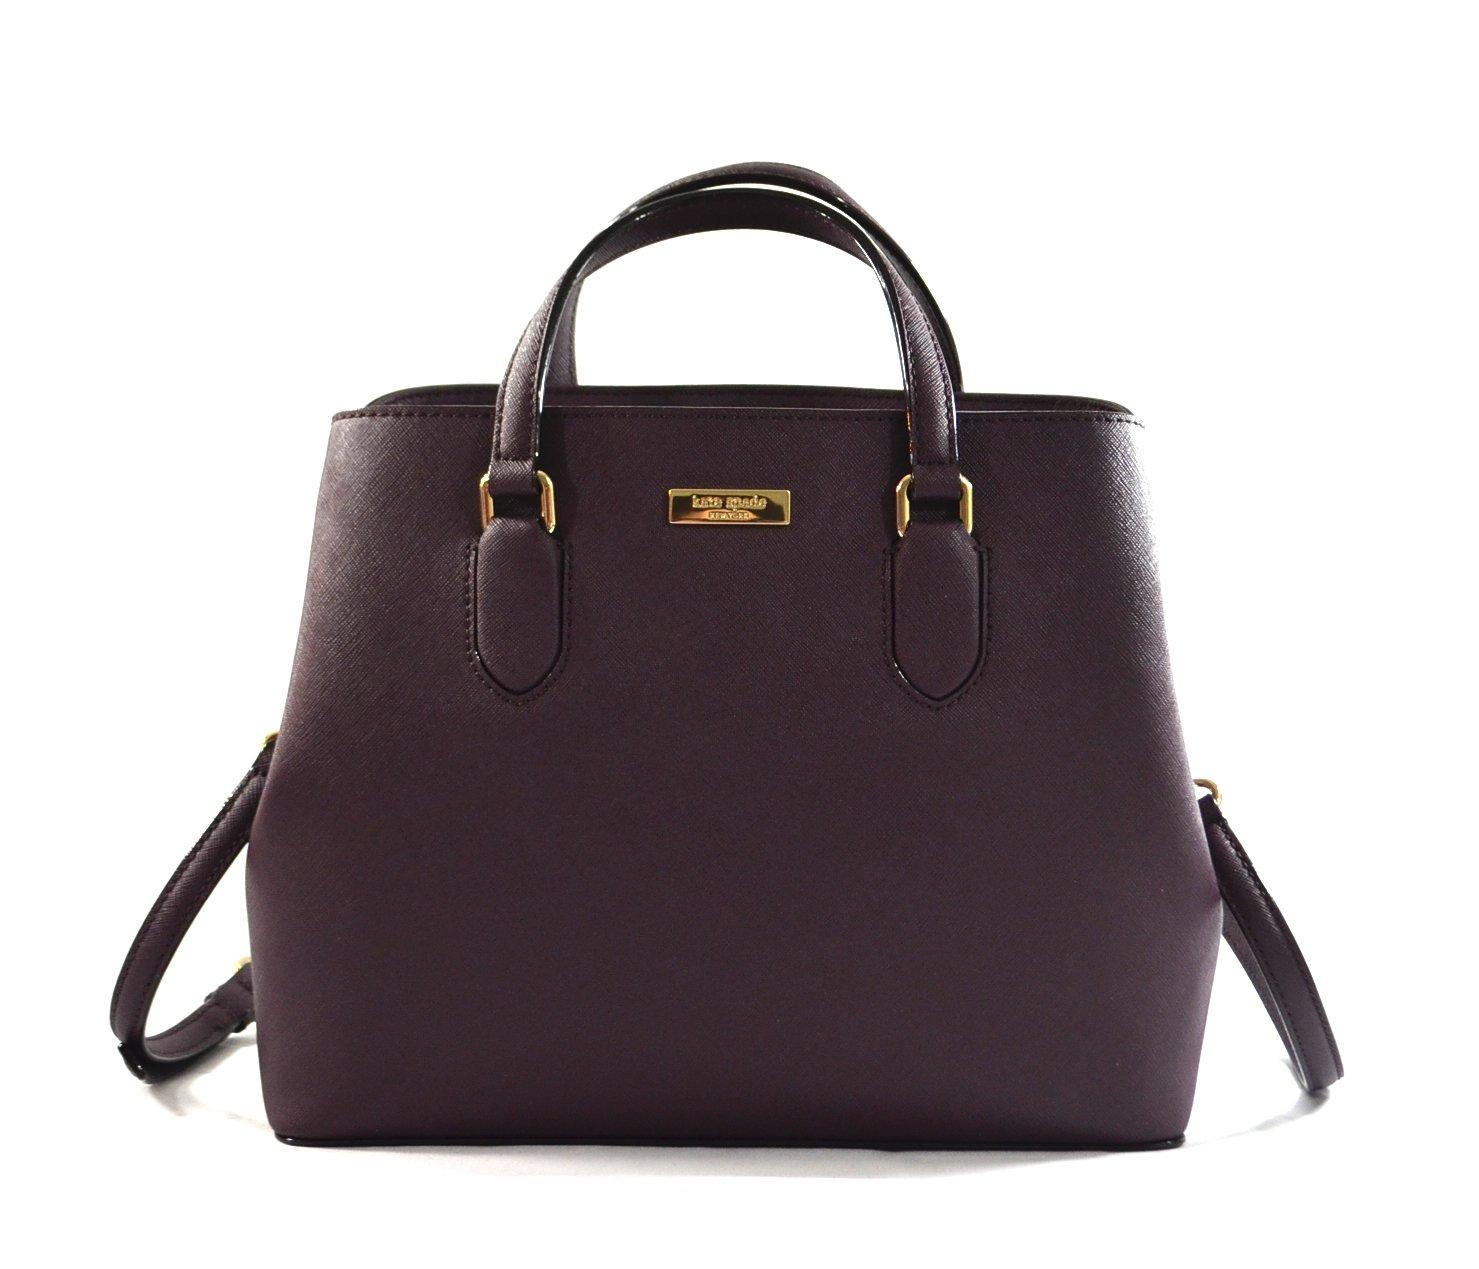 Kate Spade New York Laurel Way Evangelie Saffiano Leather Shoulder Bag Satchel (Mahogany/Wine)